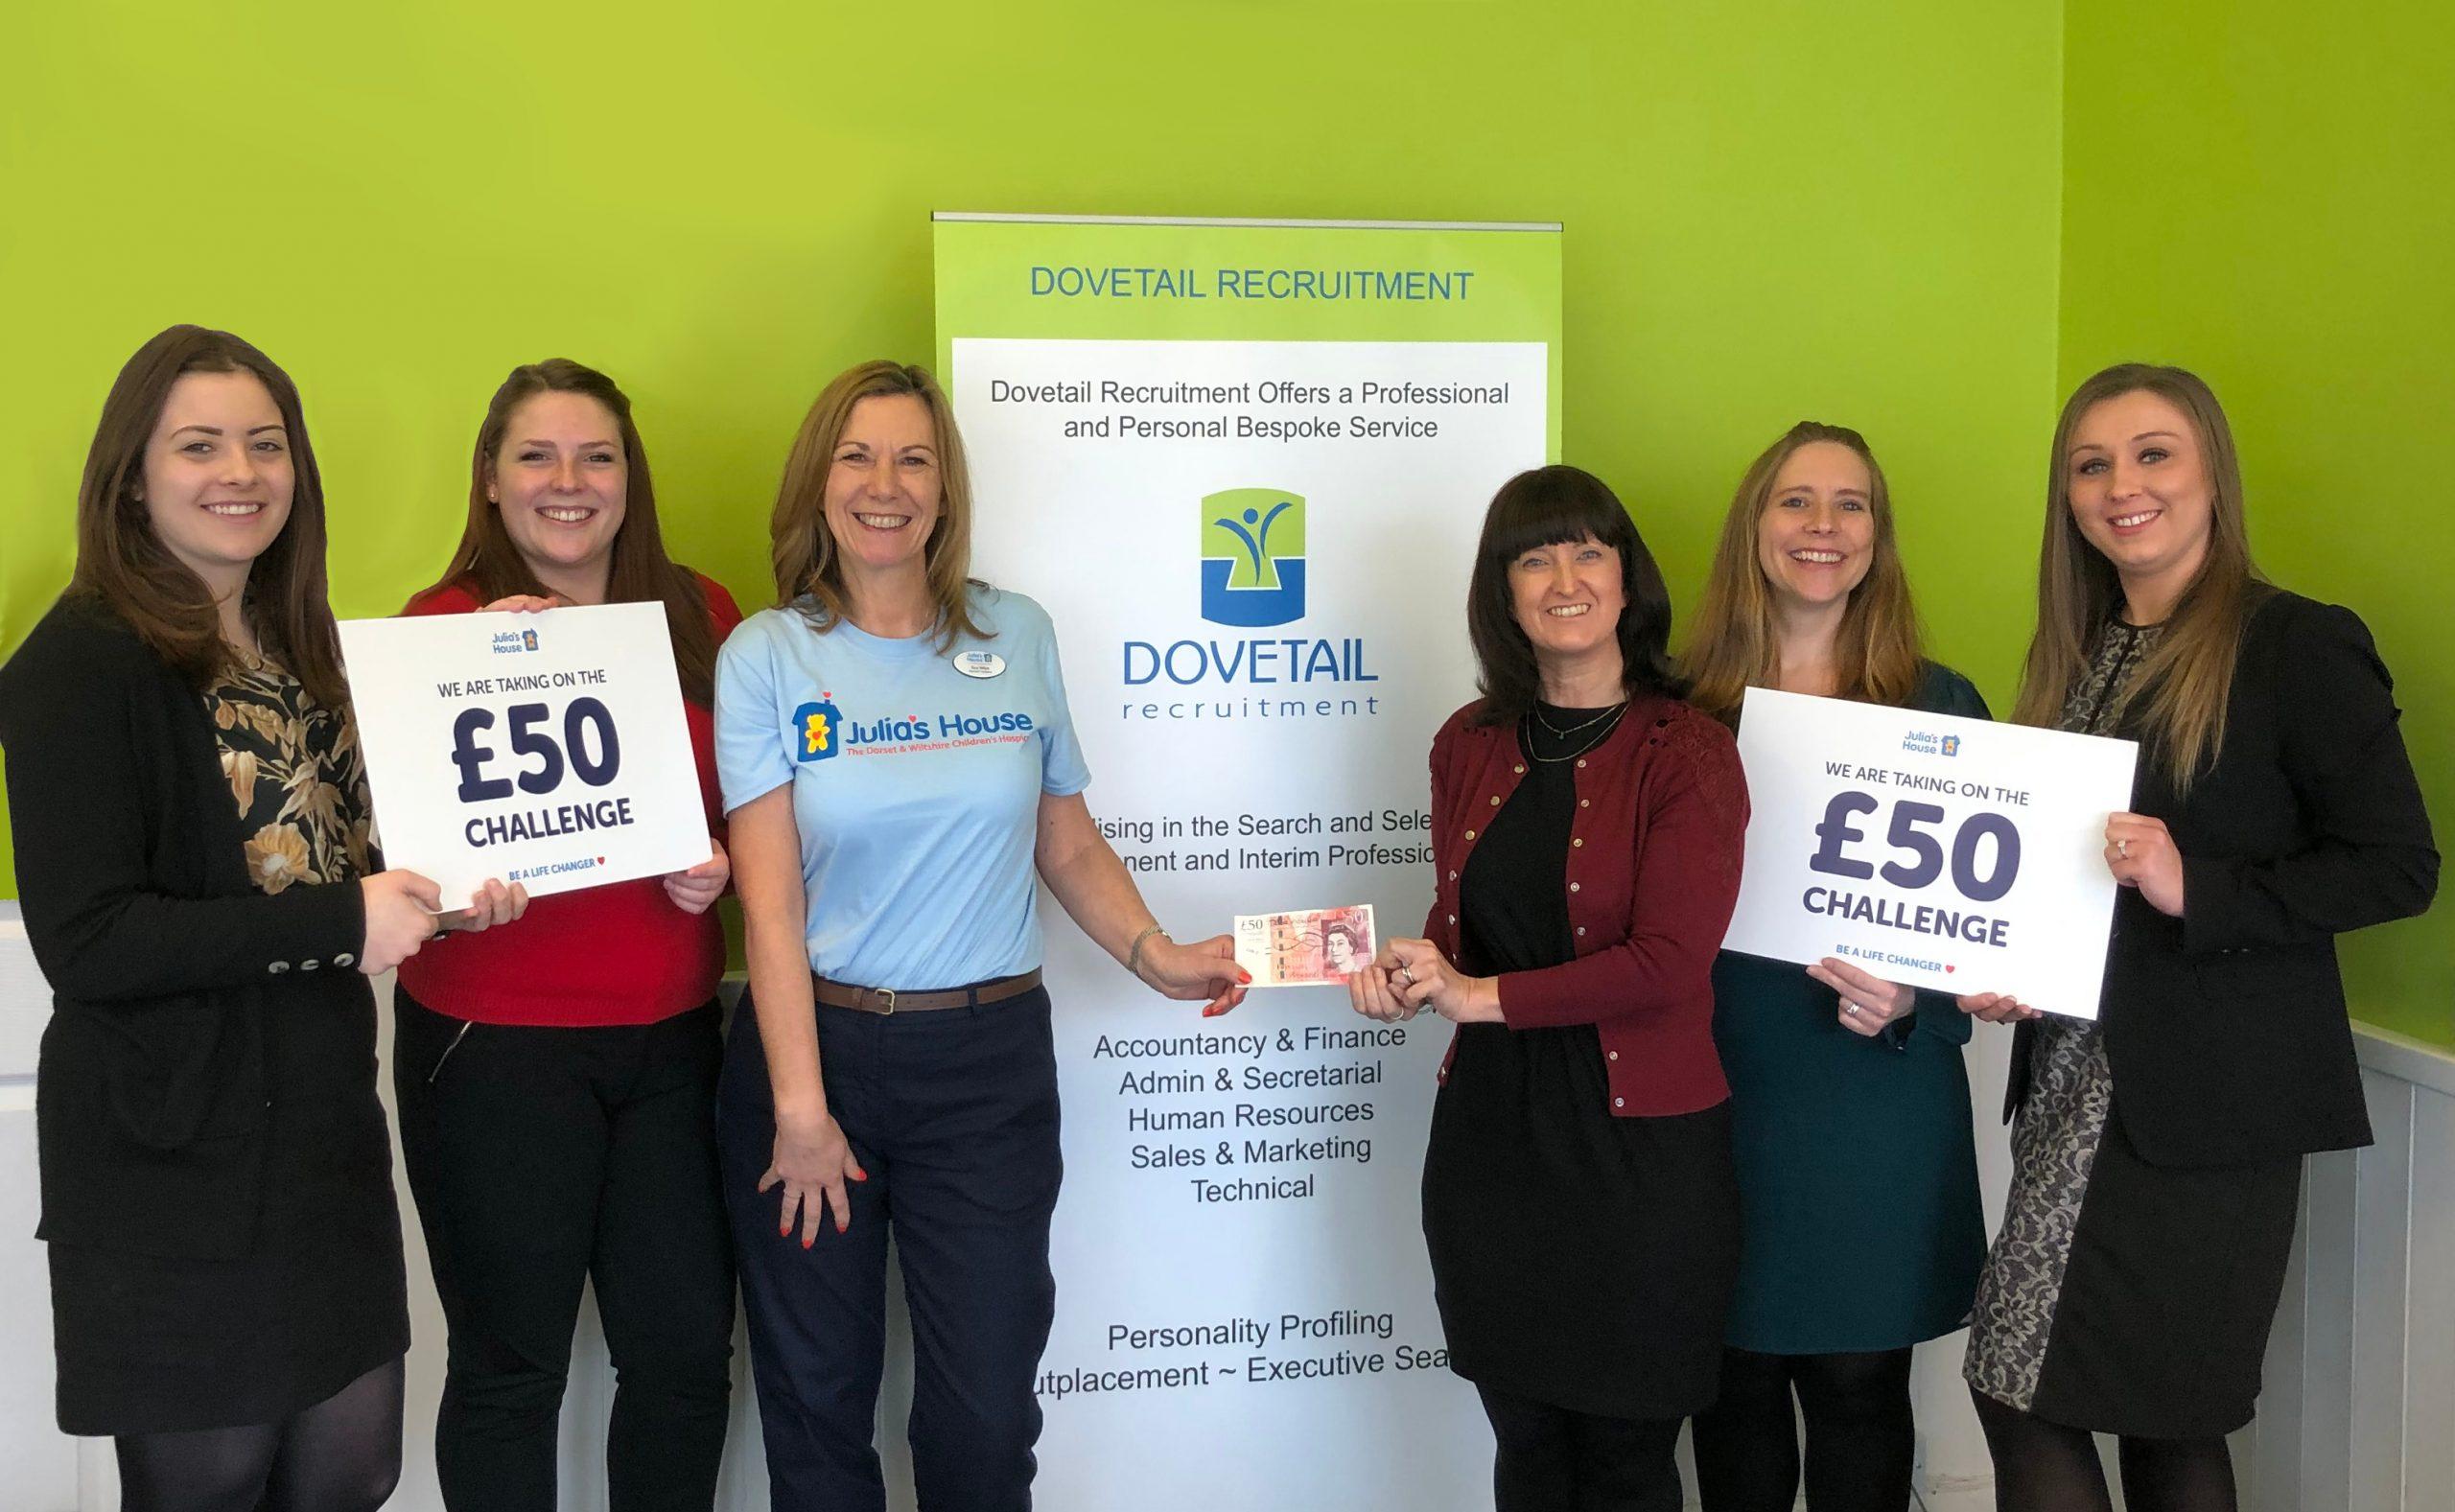 Julia's House £50 challenge